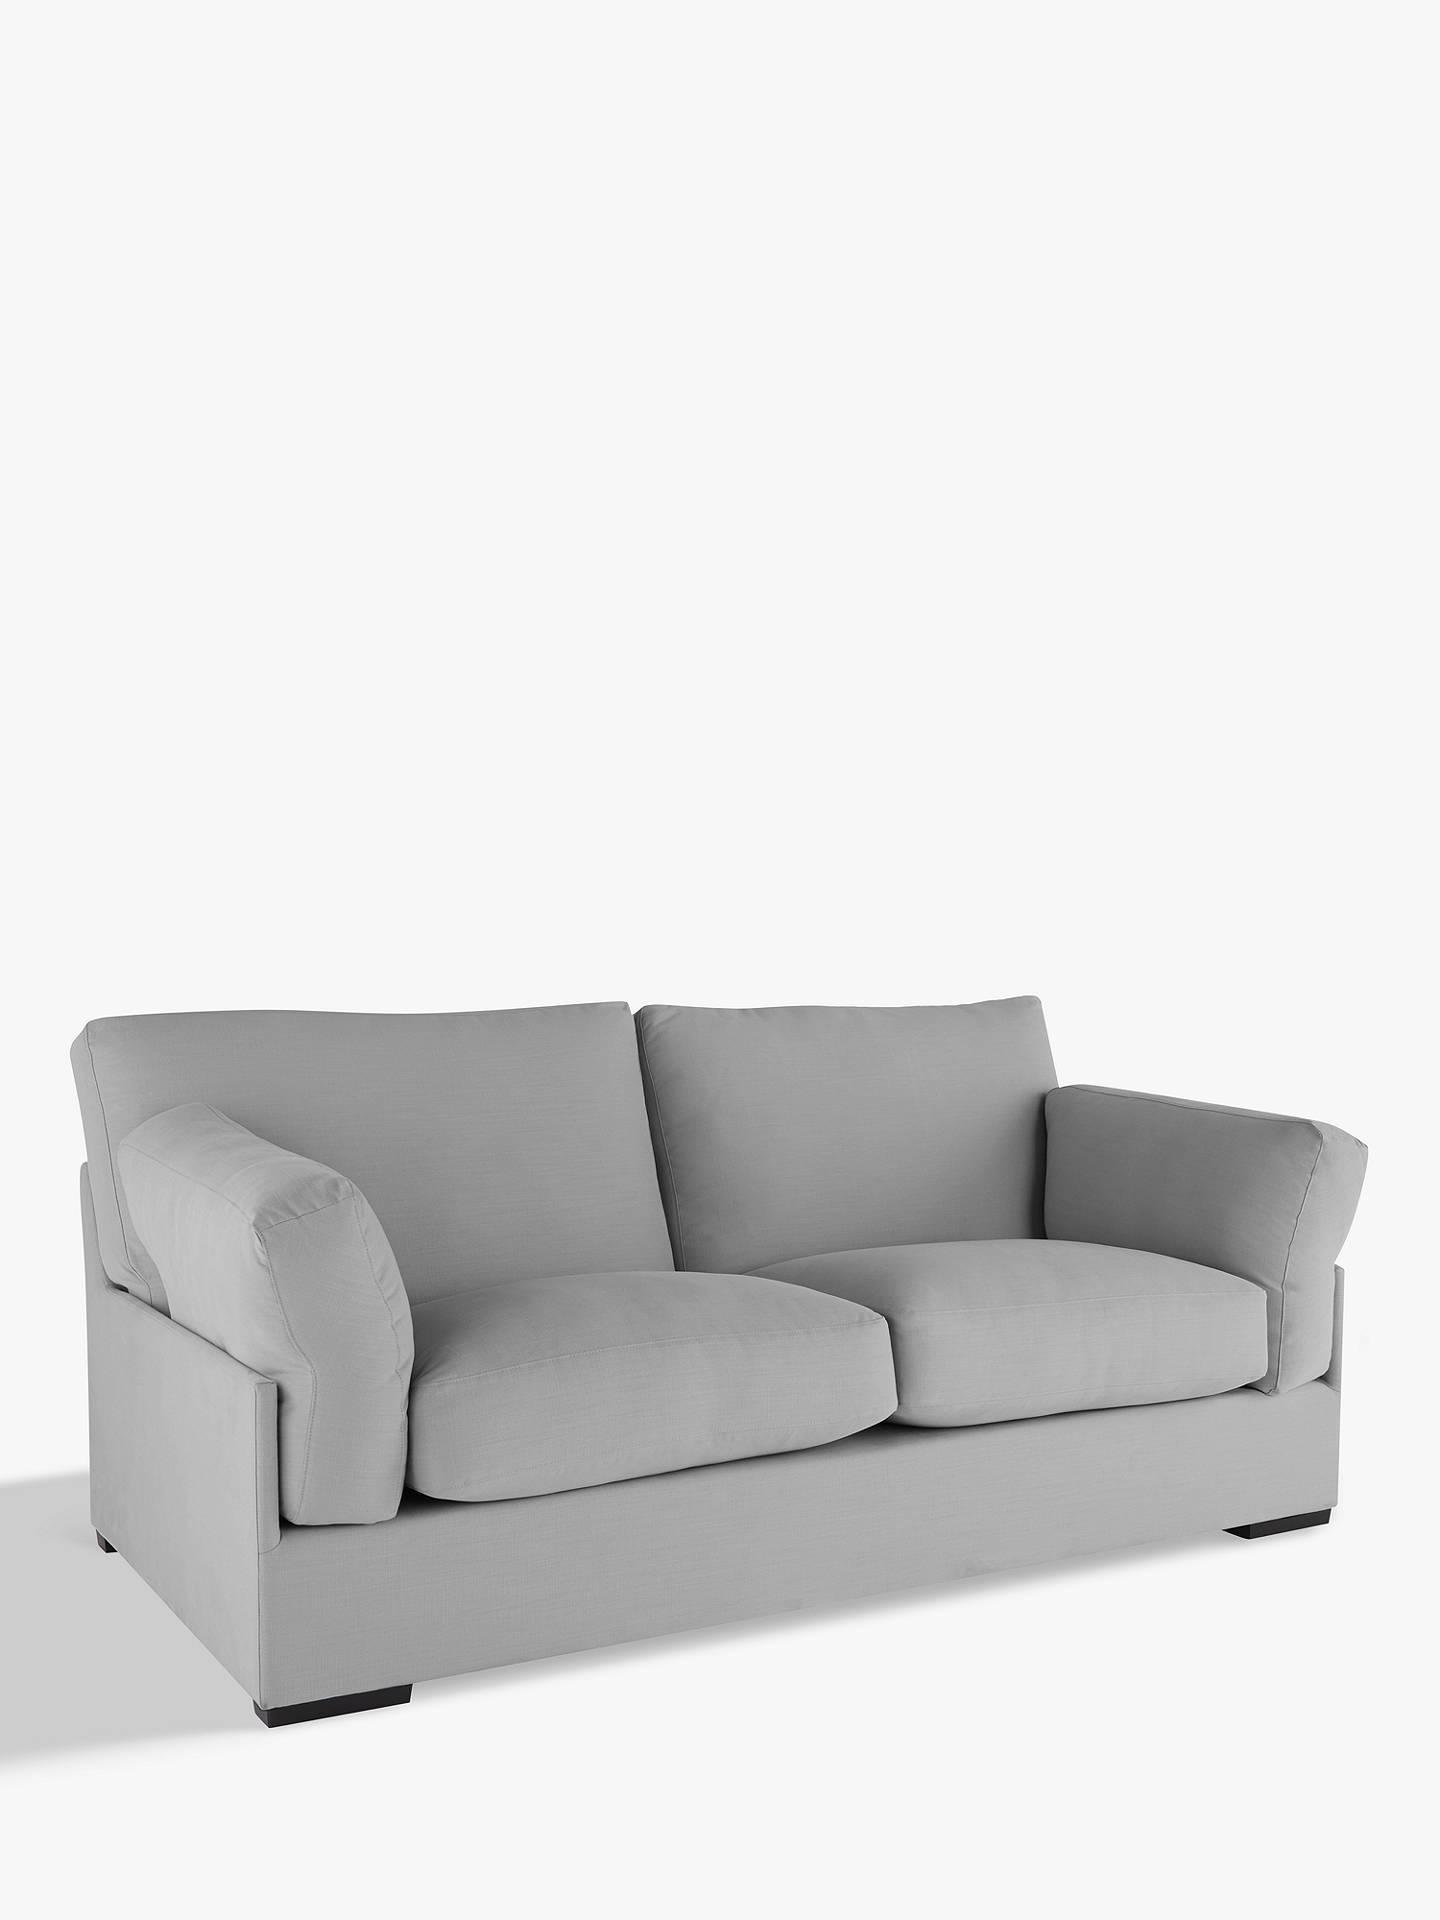 John Lewis & Partners Java Large 3 Seater Sofa at John Lewis & Partners